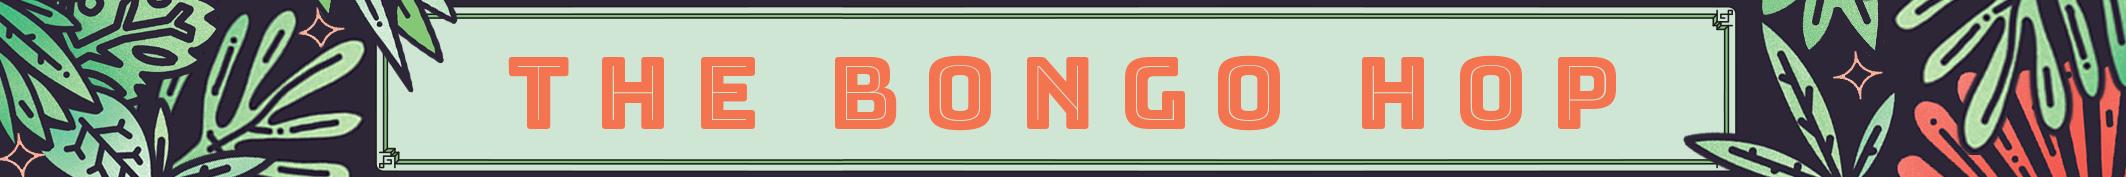 visuel titre Bongo Hop